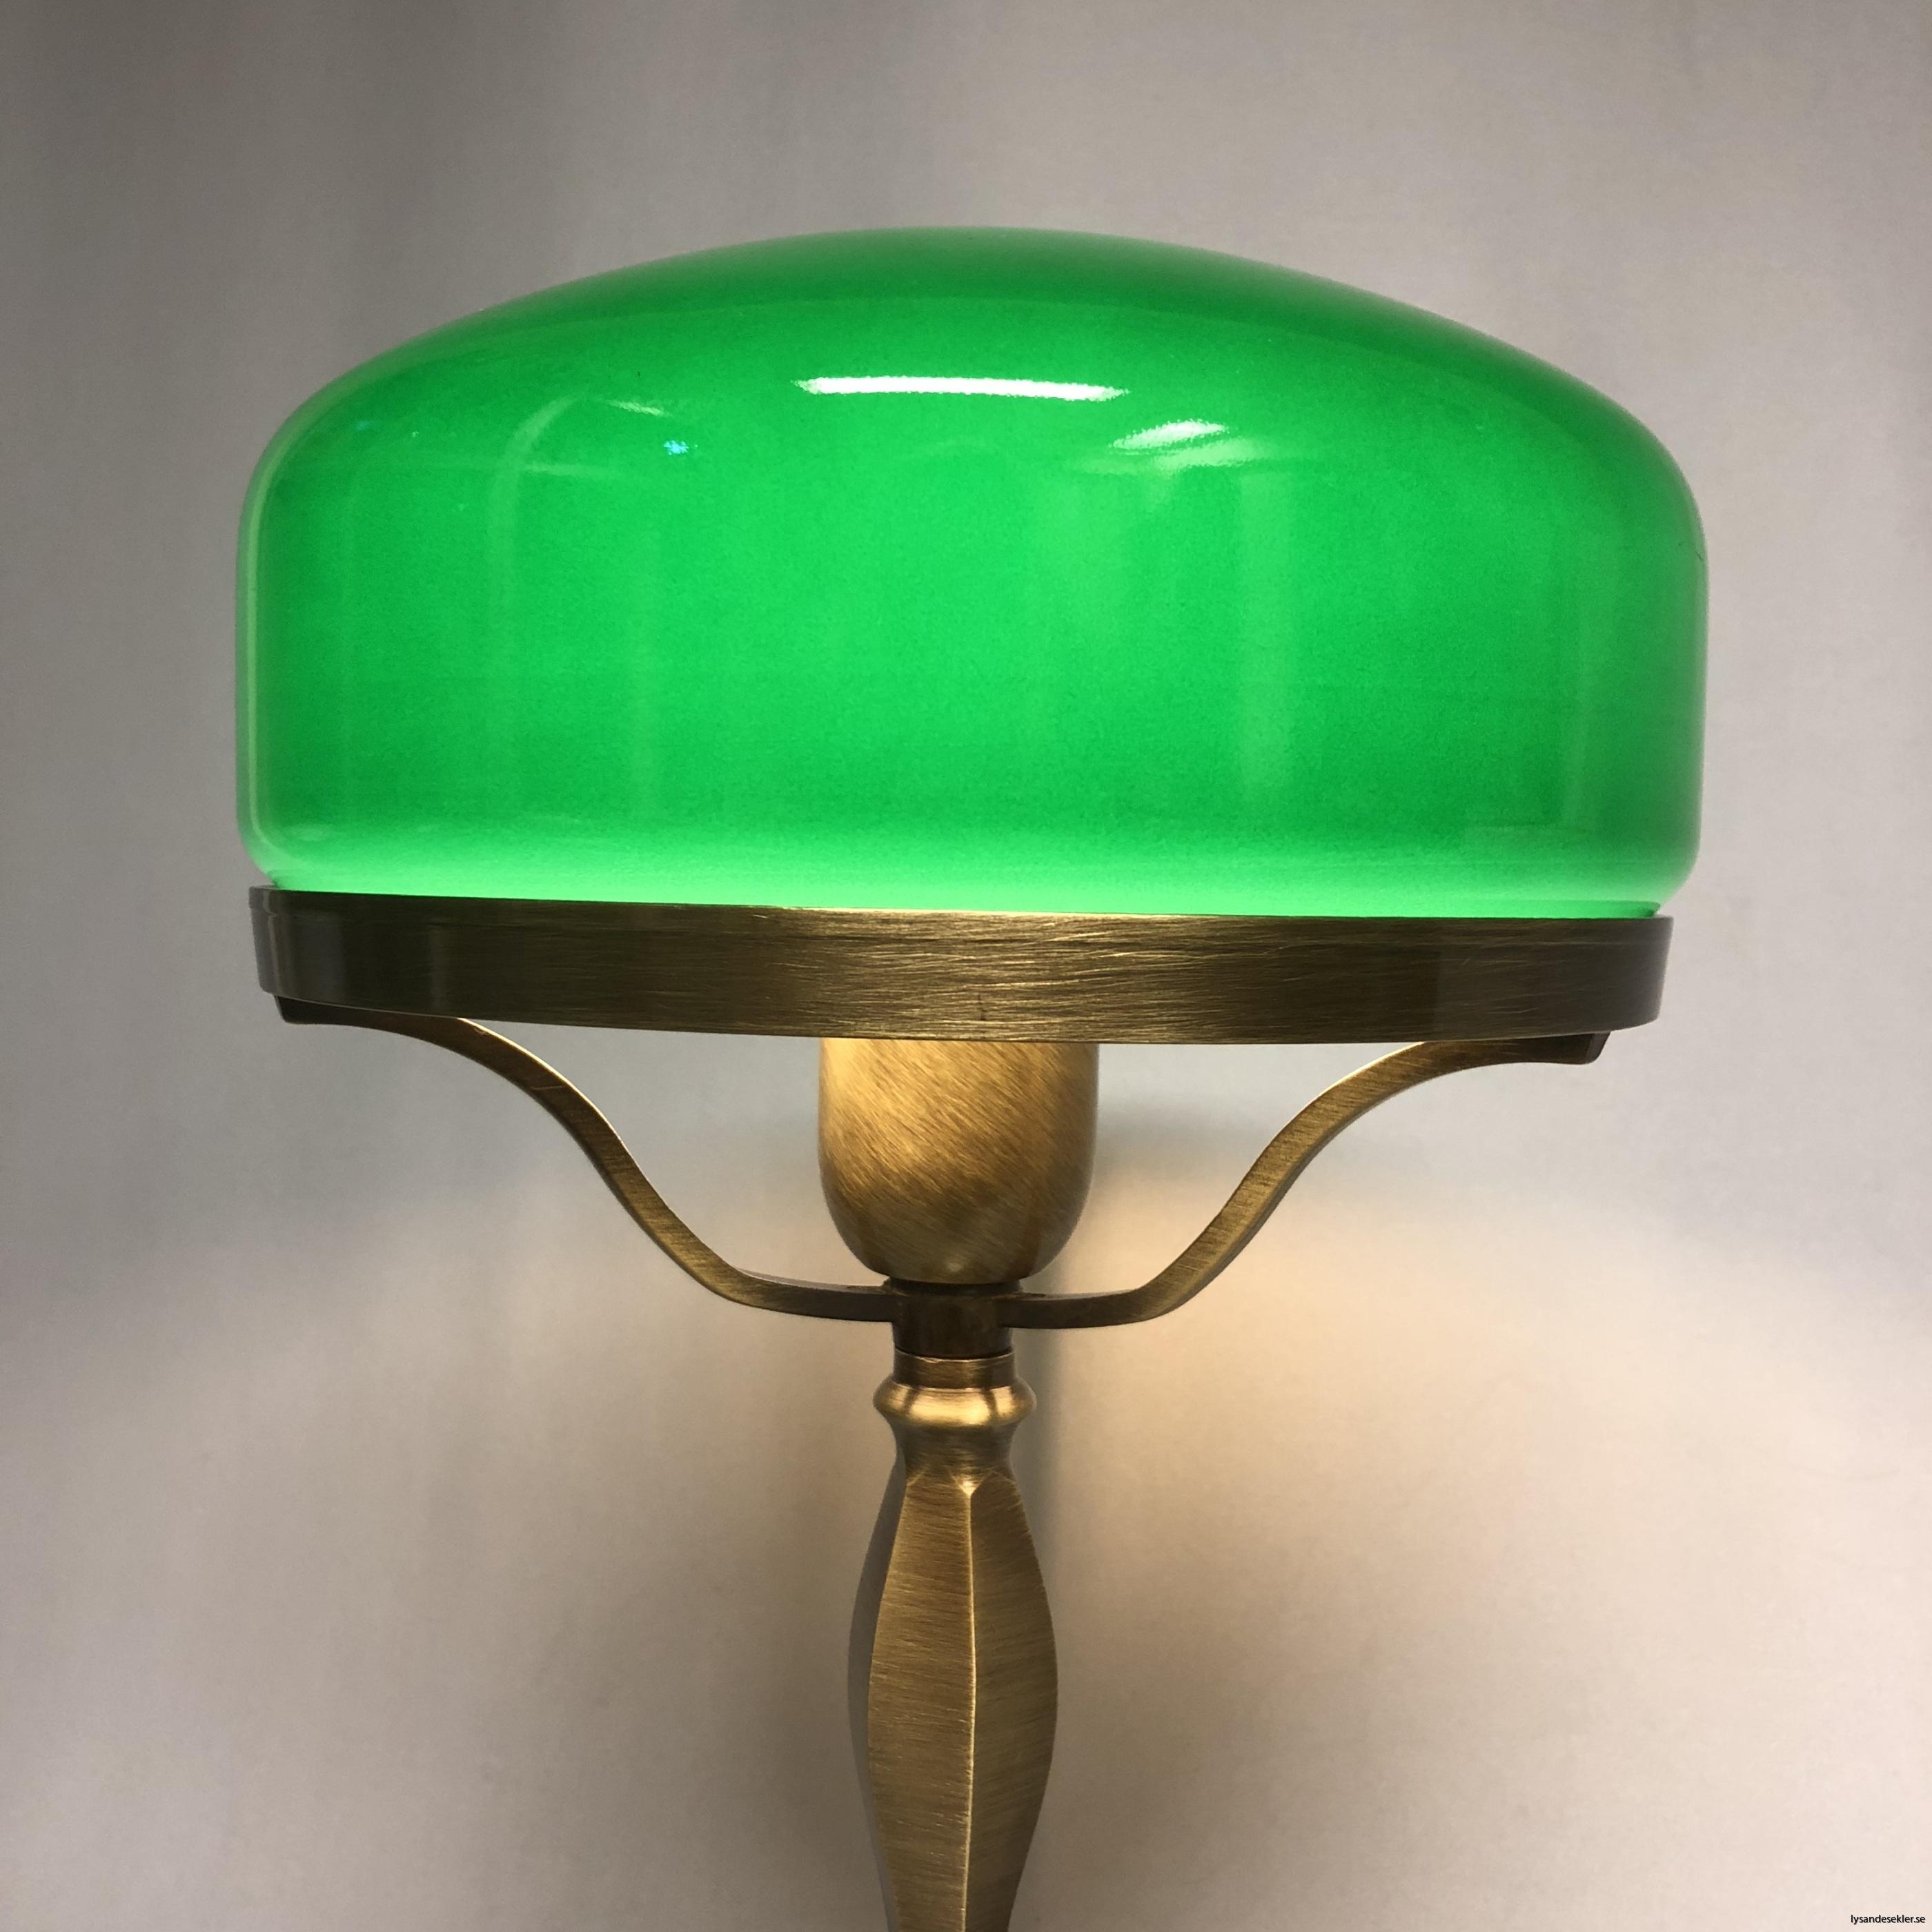 strindbergslampa strindbergslampor strindberg lampa skärm kupa strindbergsskärm strindbergskupa35